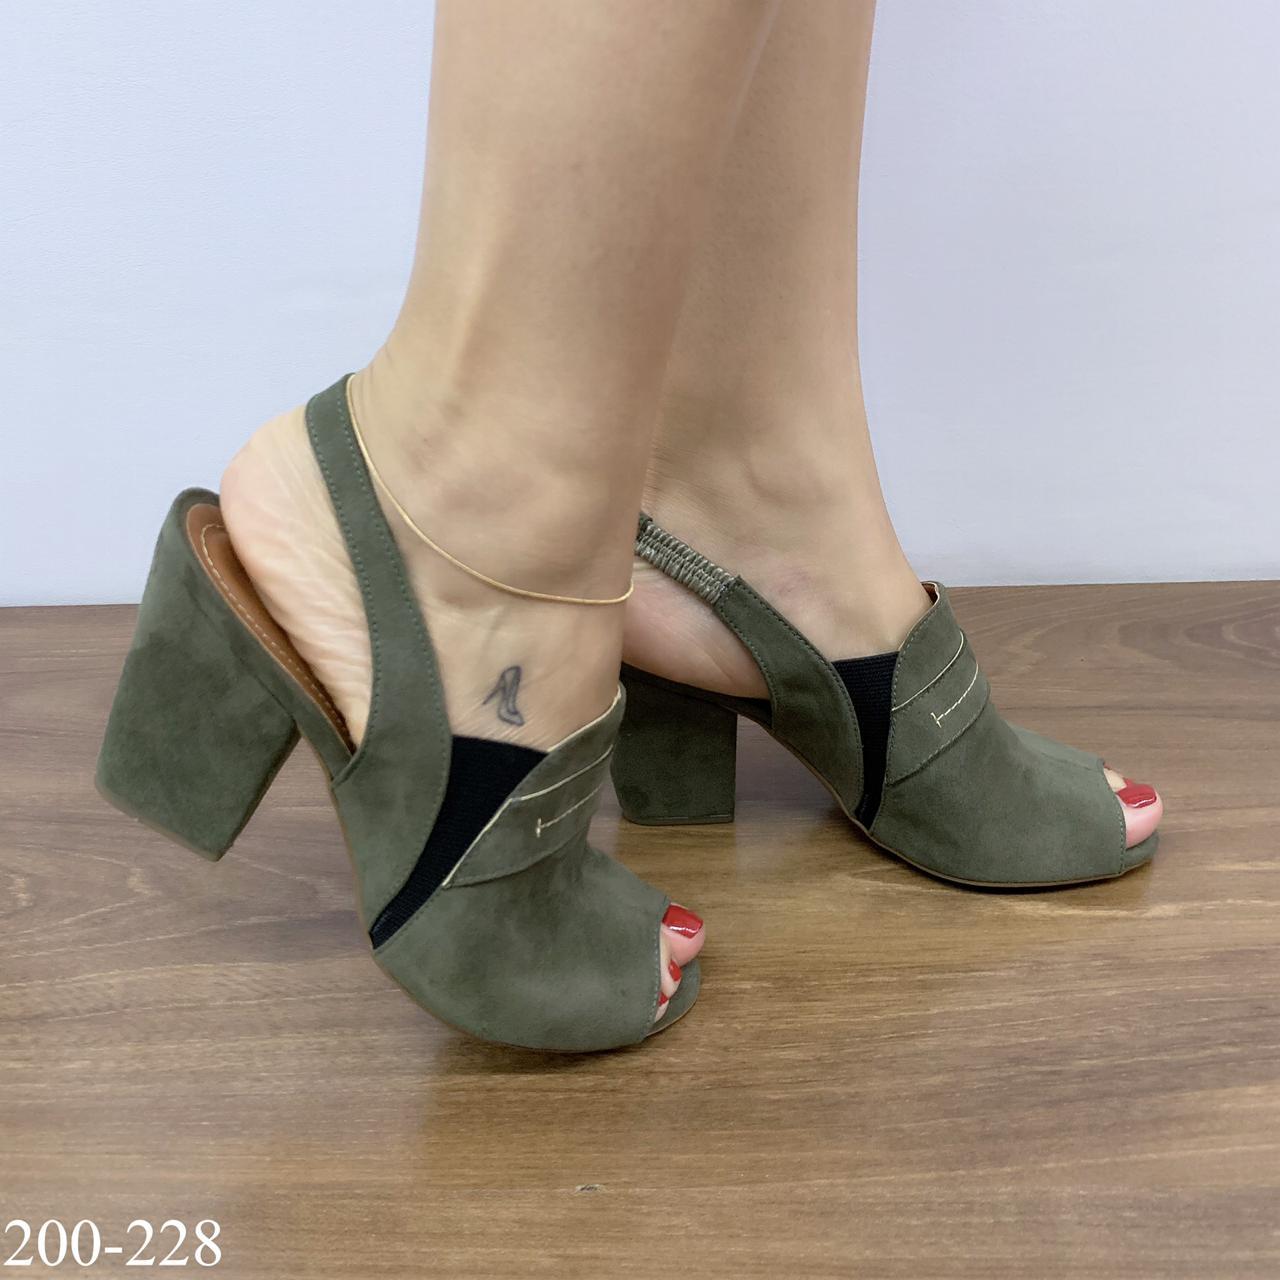 Sandalia Verde Militar Salto Bloco | D-200-228